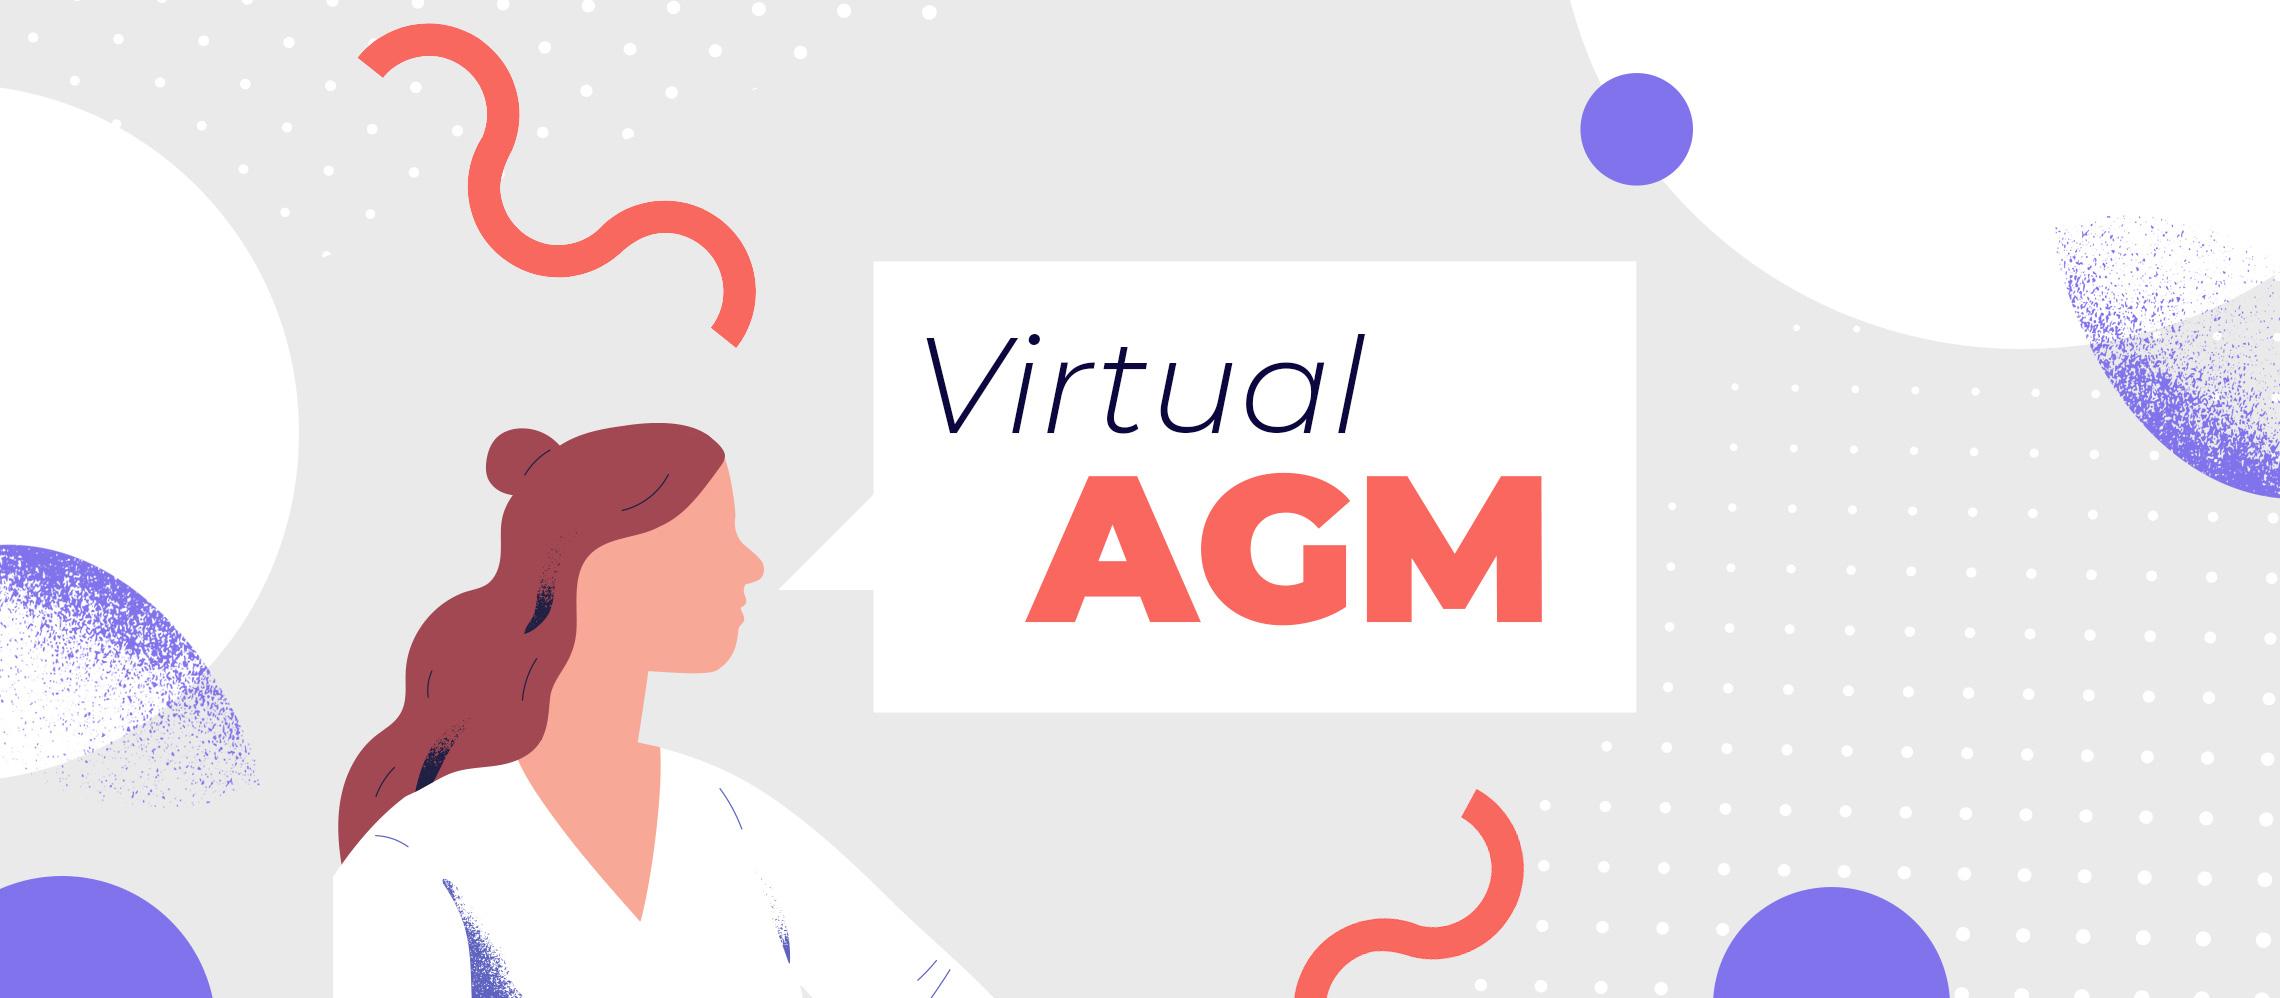 Virtual AGM | Annual General Meeting online | Buffalo 7